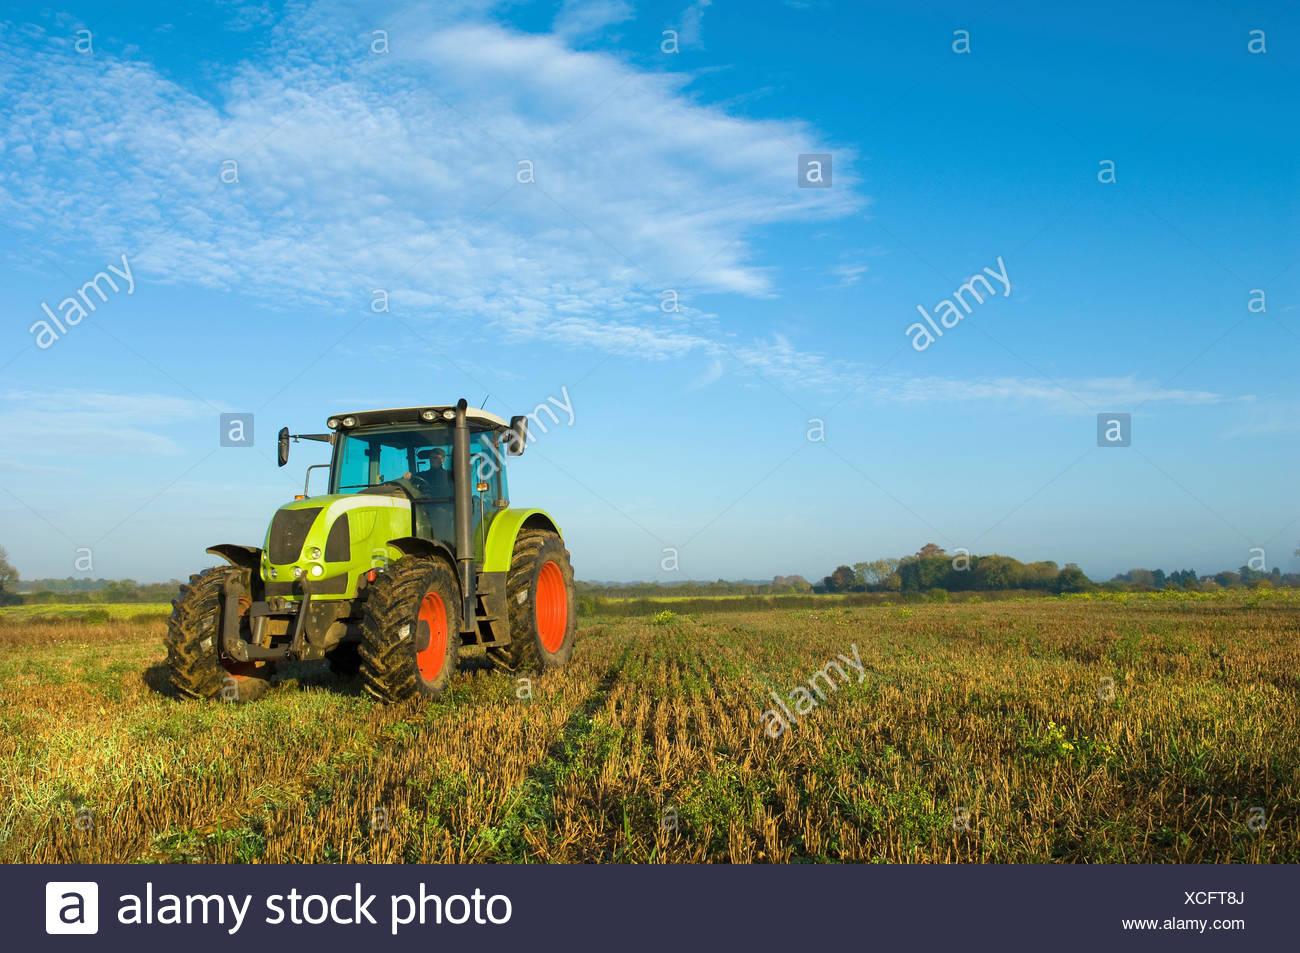 Ein Traktor in einem Stoppelfeld in Gloucestershire. Stockbild